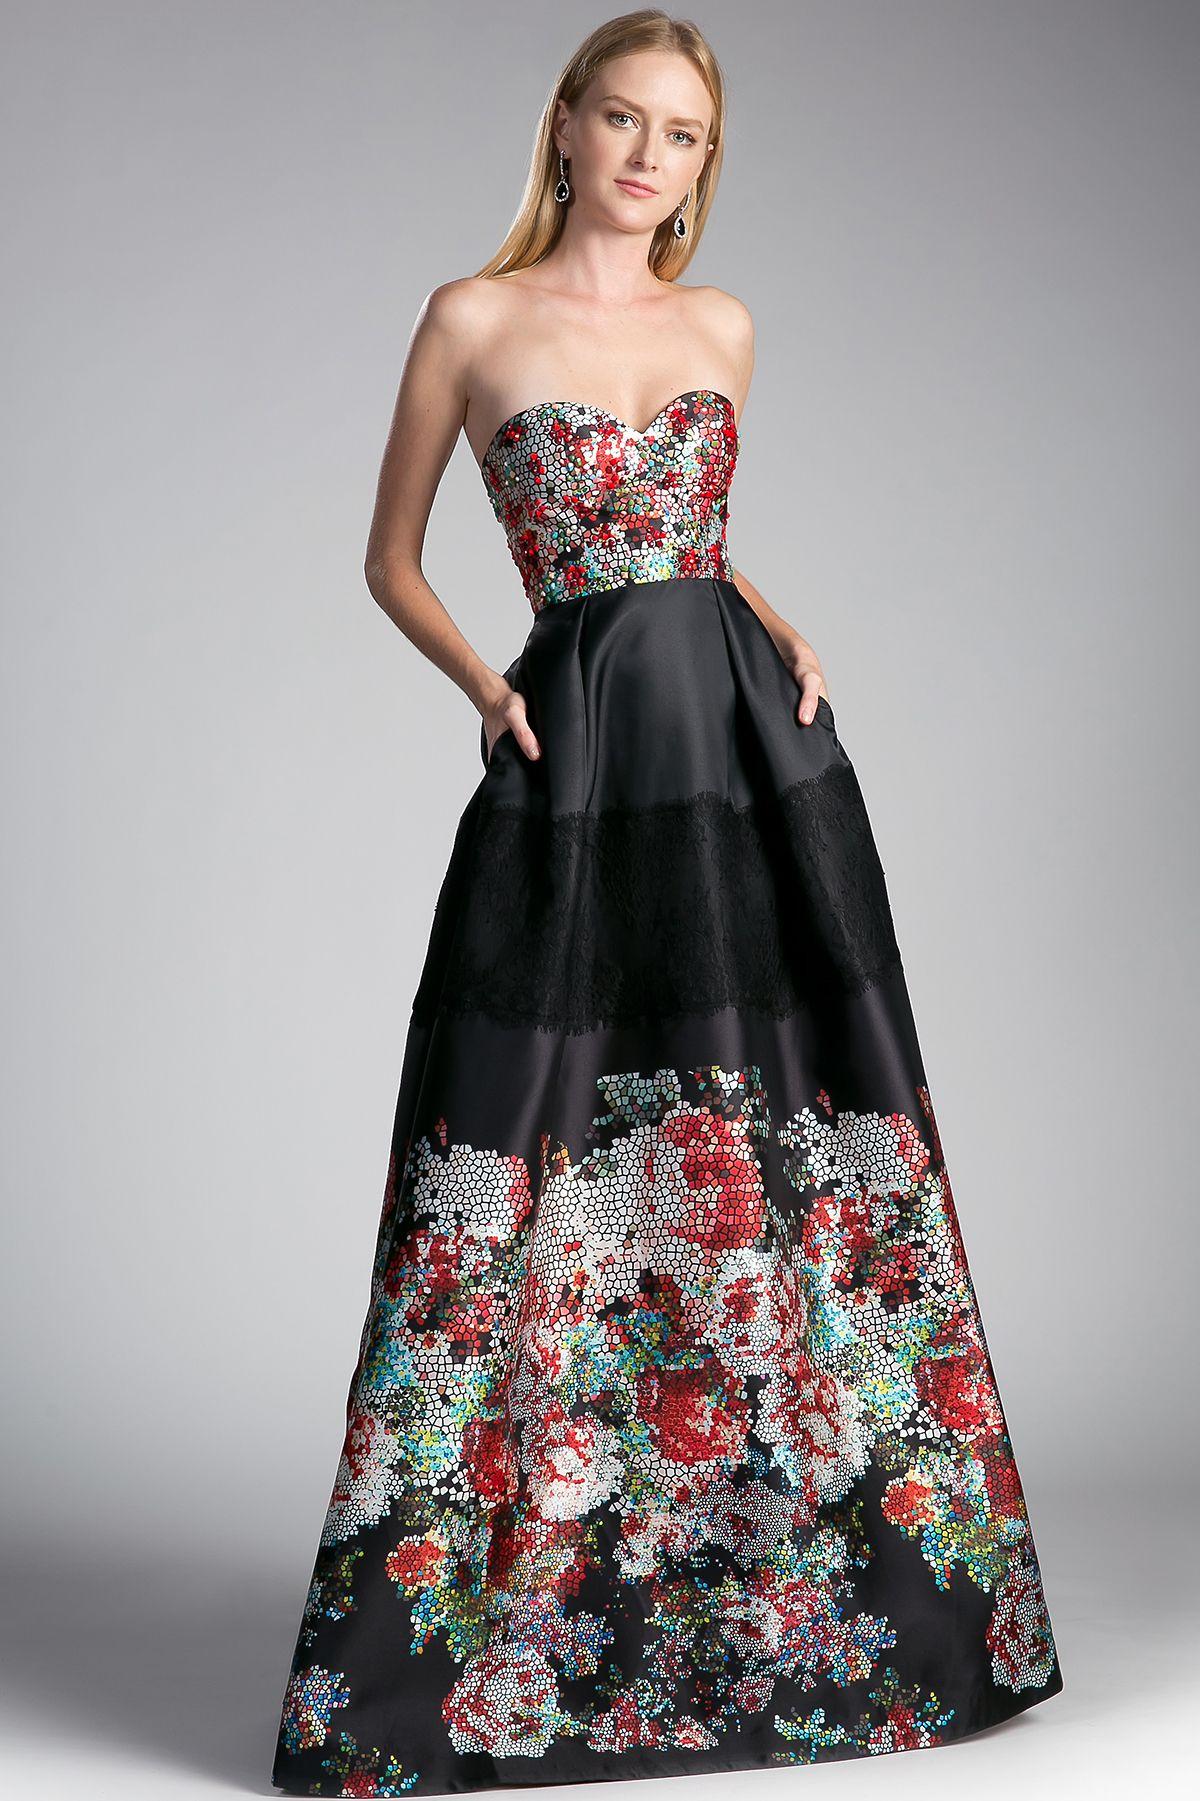 Elegant long dress has sweetheart neckline and open back it also